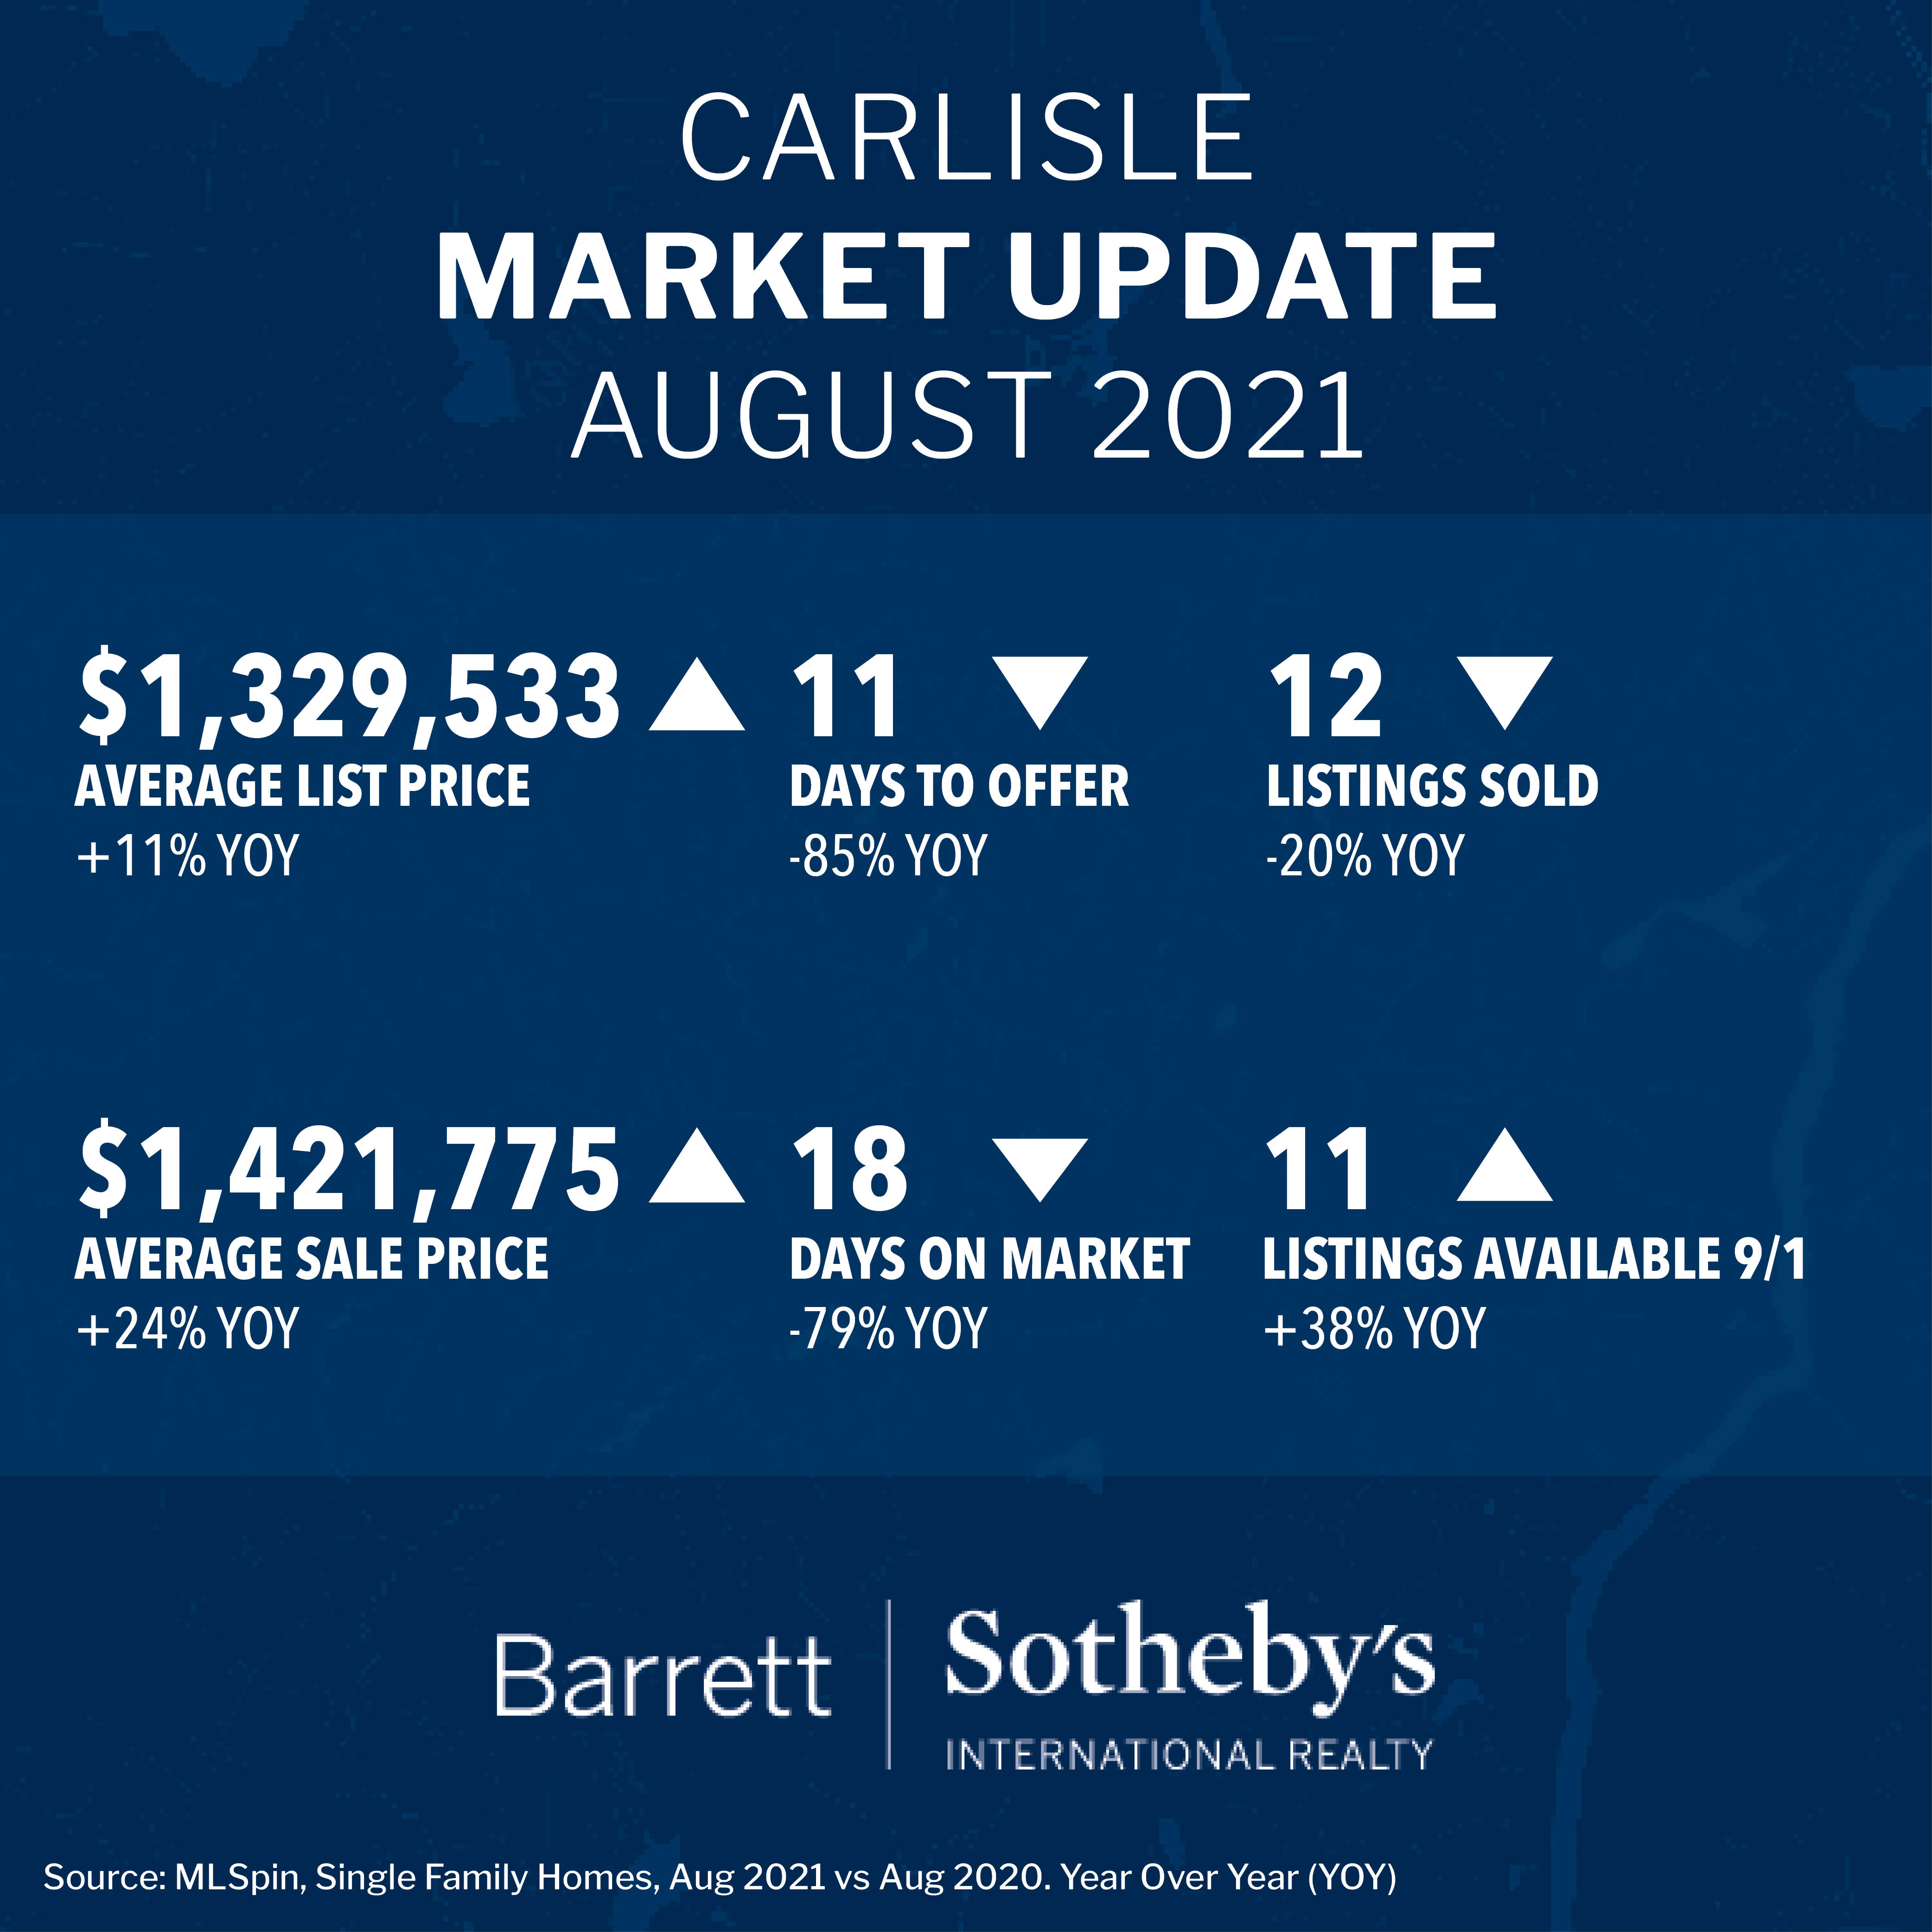 Carlisle Market Update August 2021